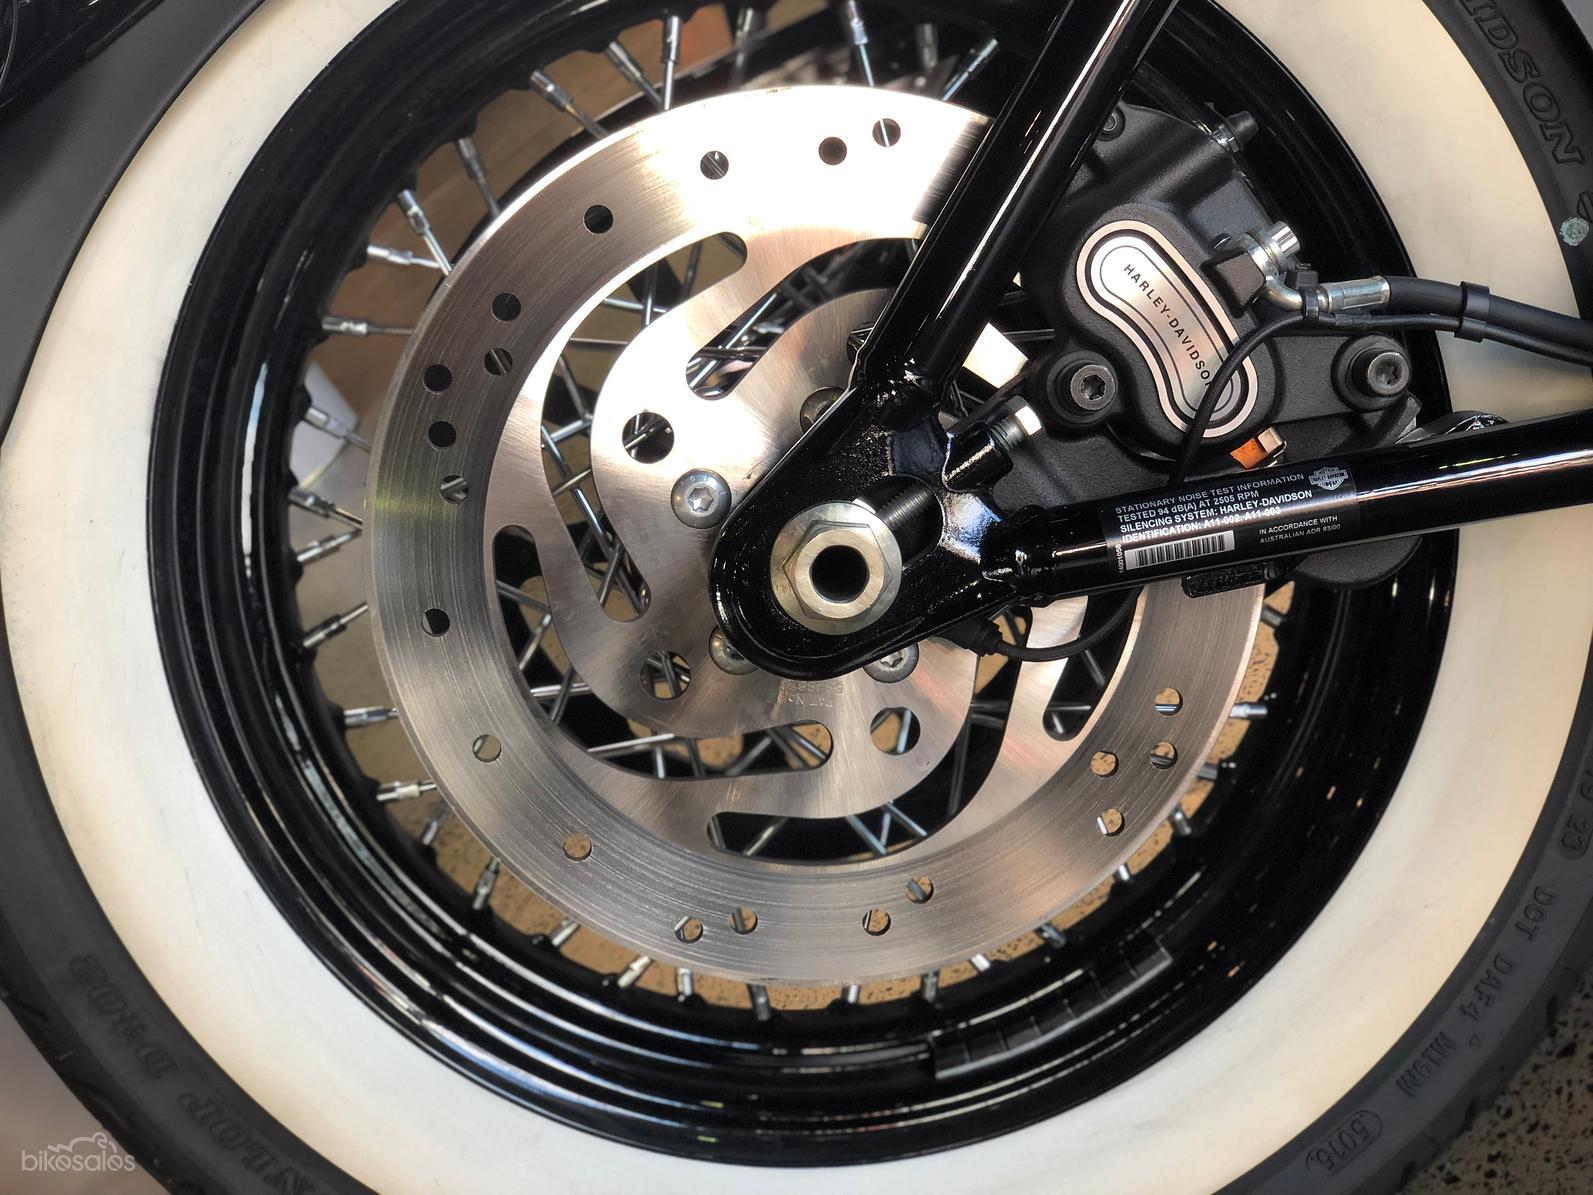 2016 Harley-Davidson Softail Slim (FLS)-OAG-AD-17380921